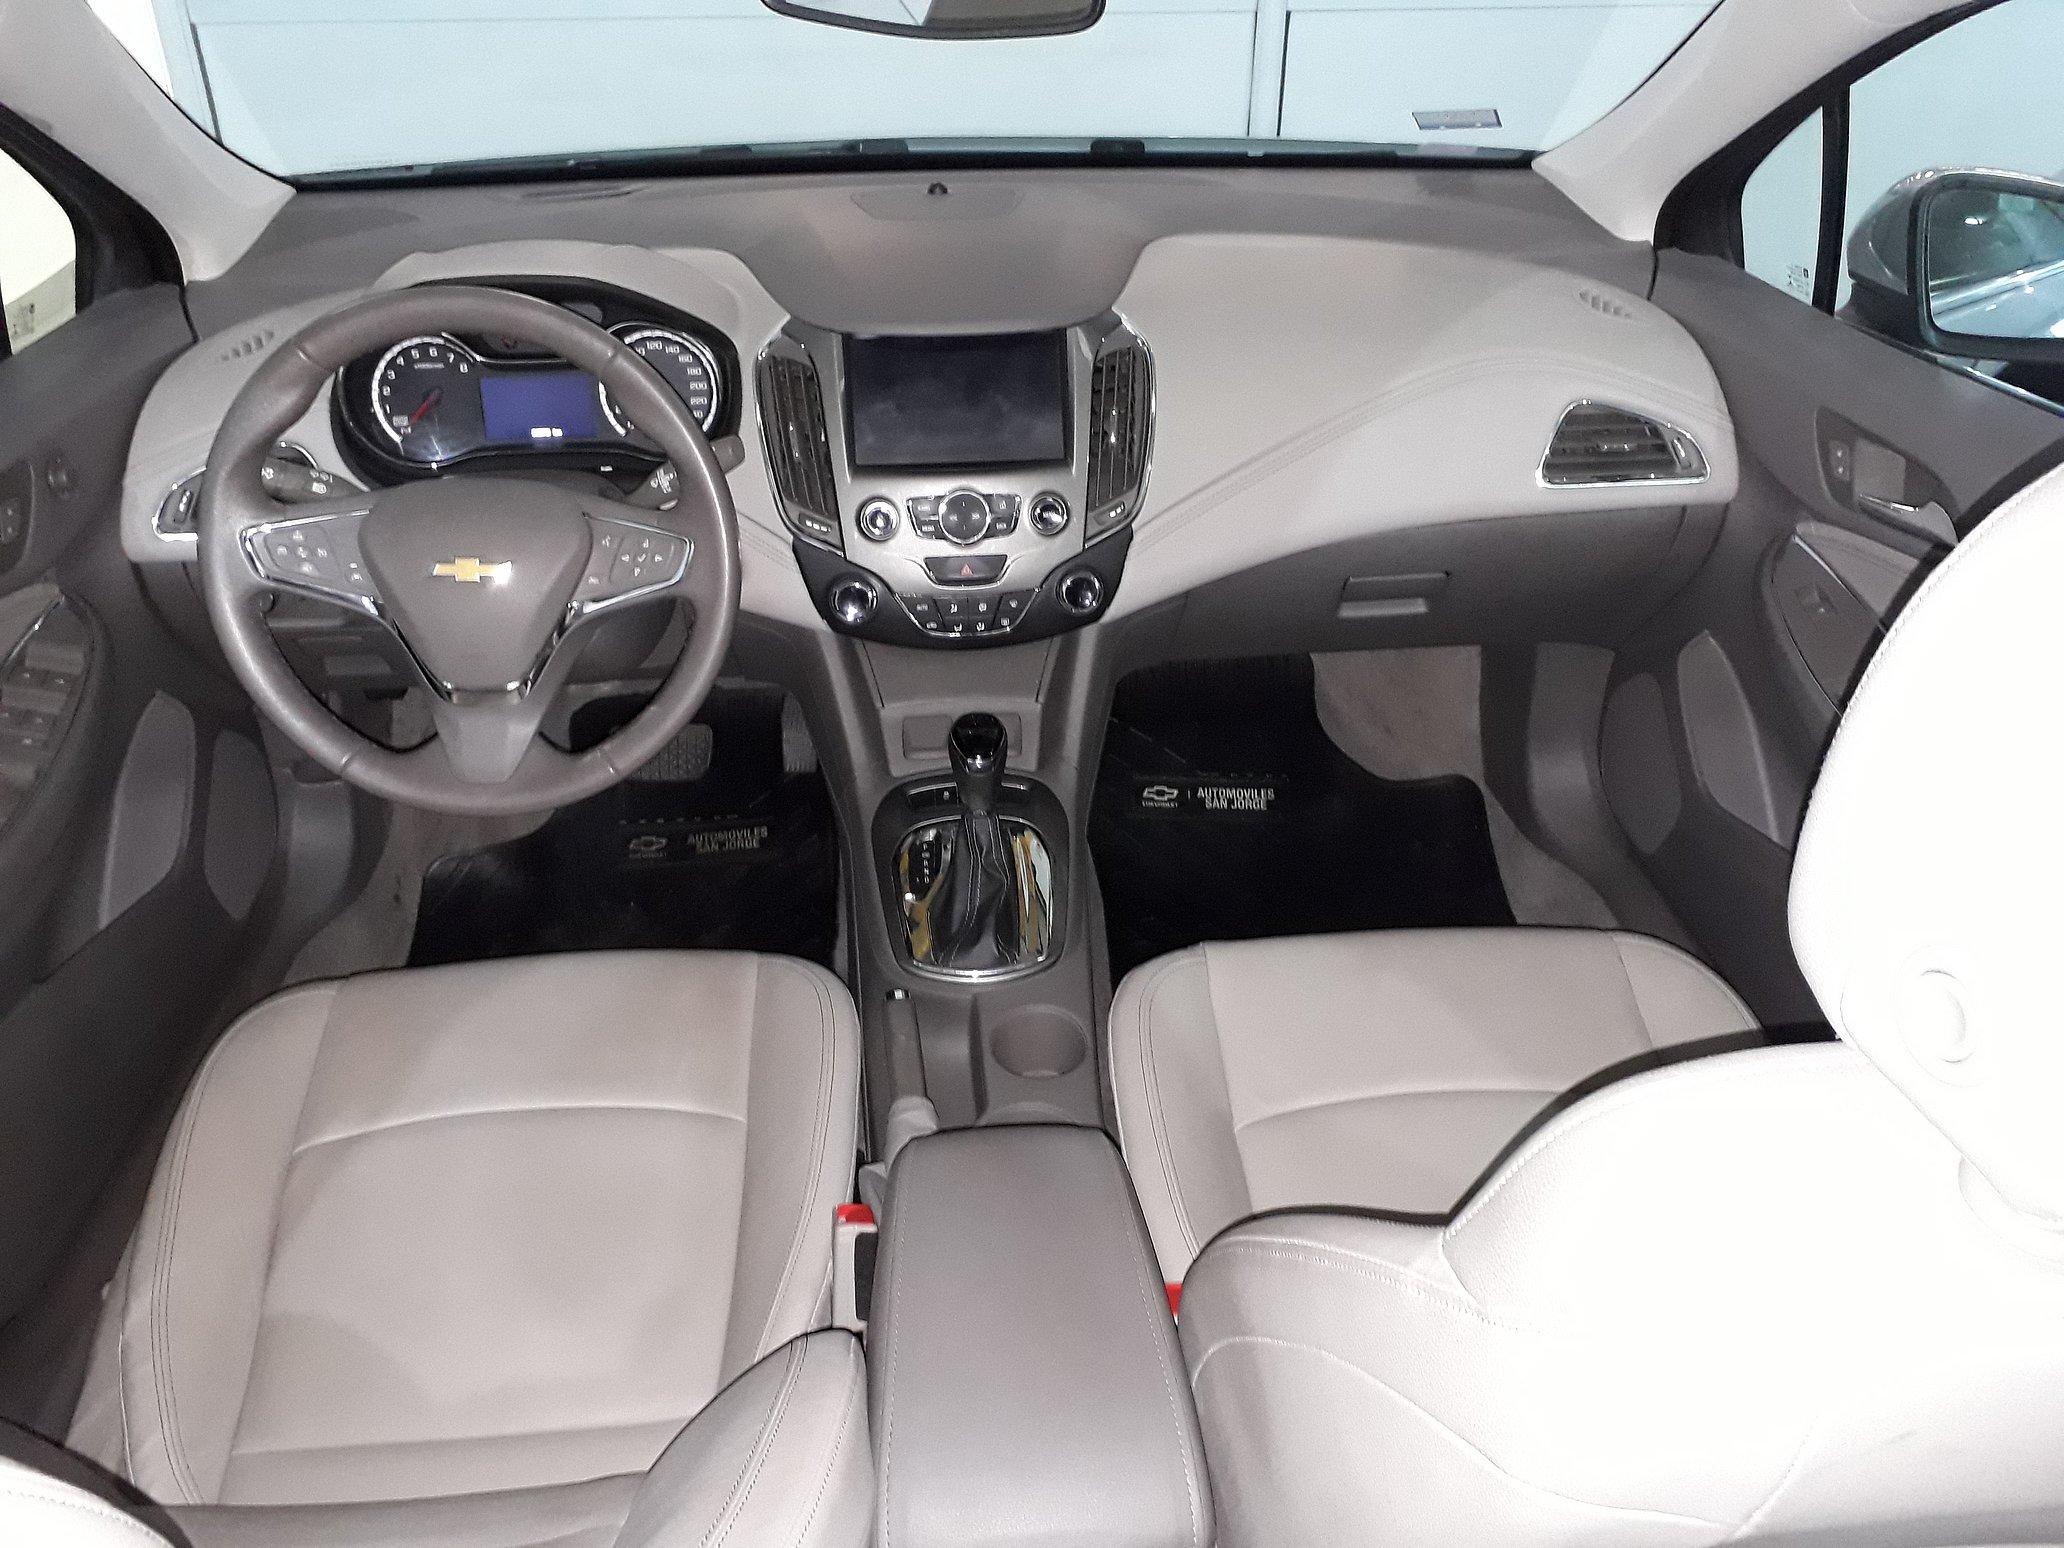 2016 Chevrolet Cruze LTZ + 1,4L Turbo